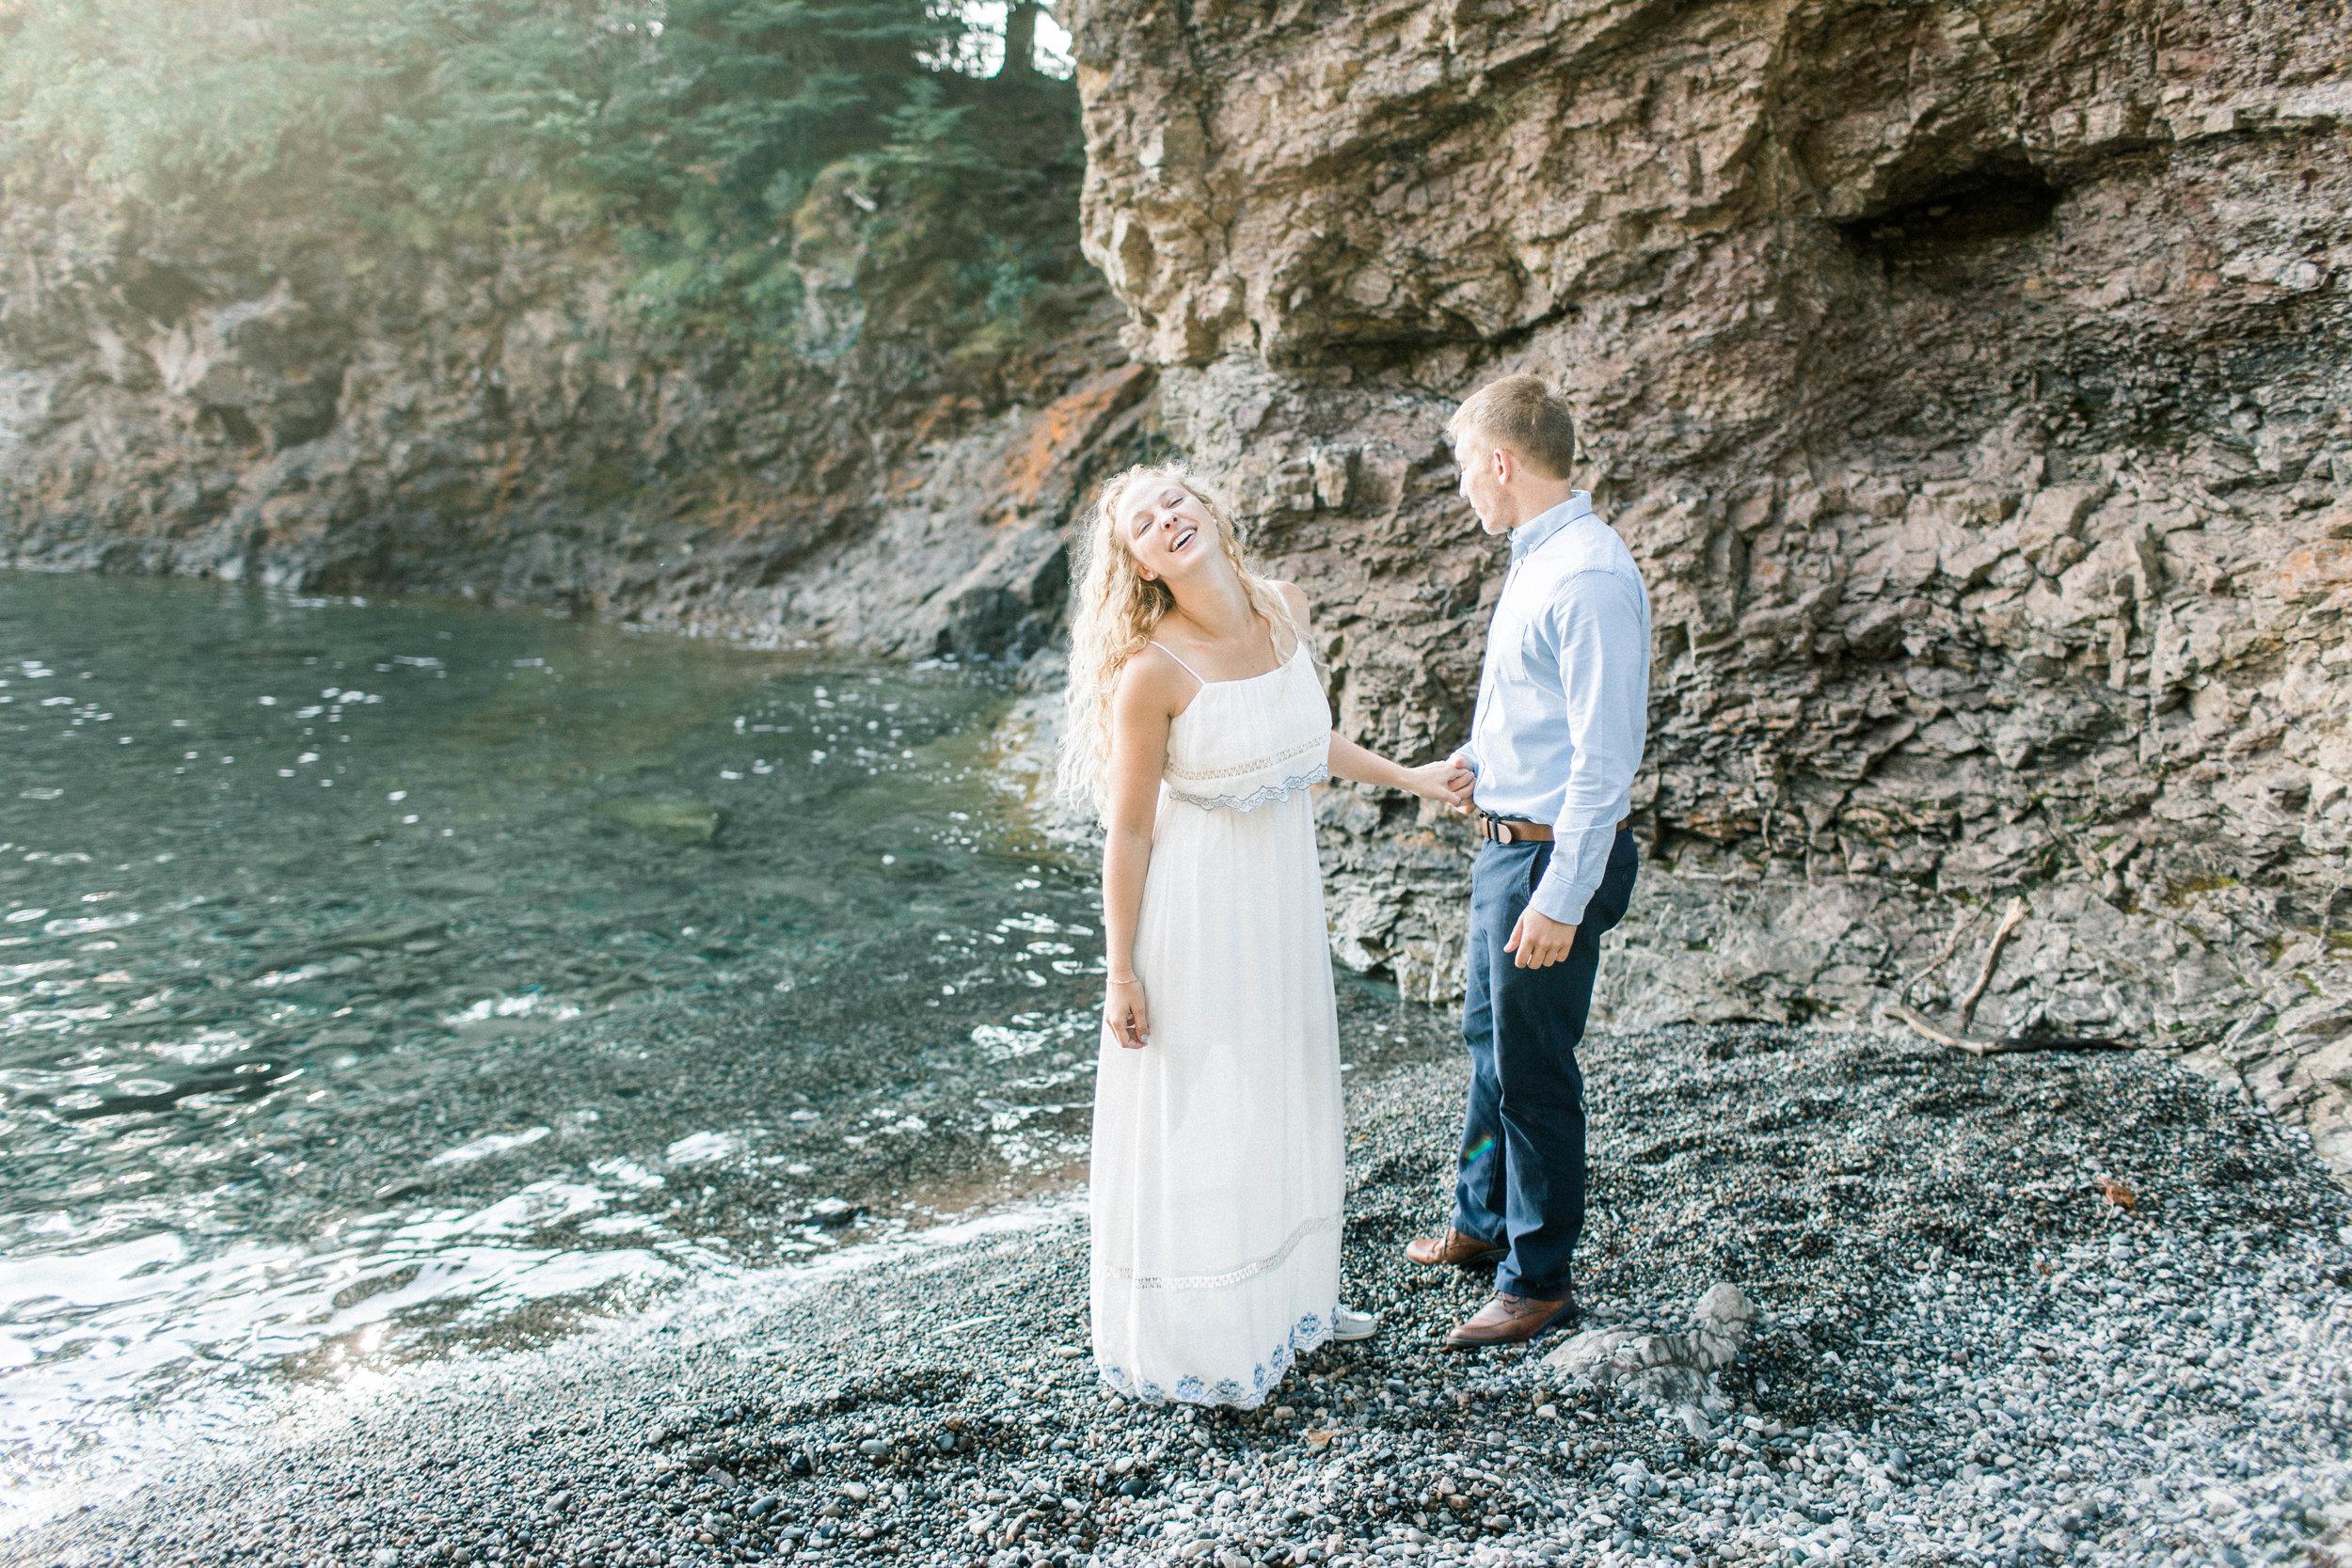 Northern Michigan Engagement Photographer - Lauren and Brent 045.jpg